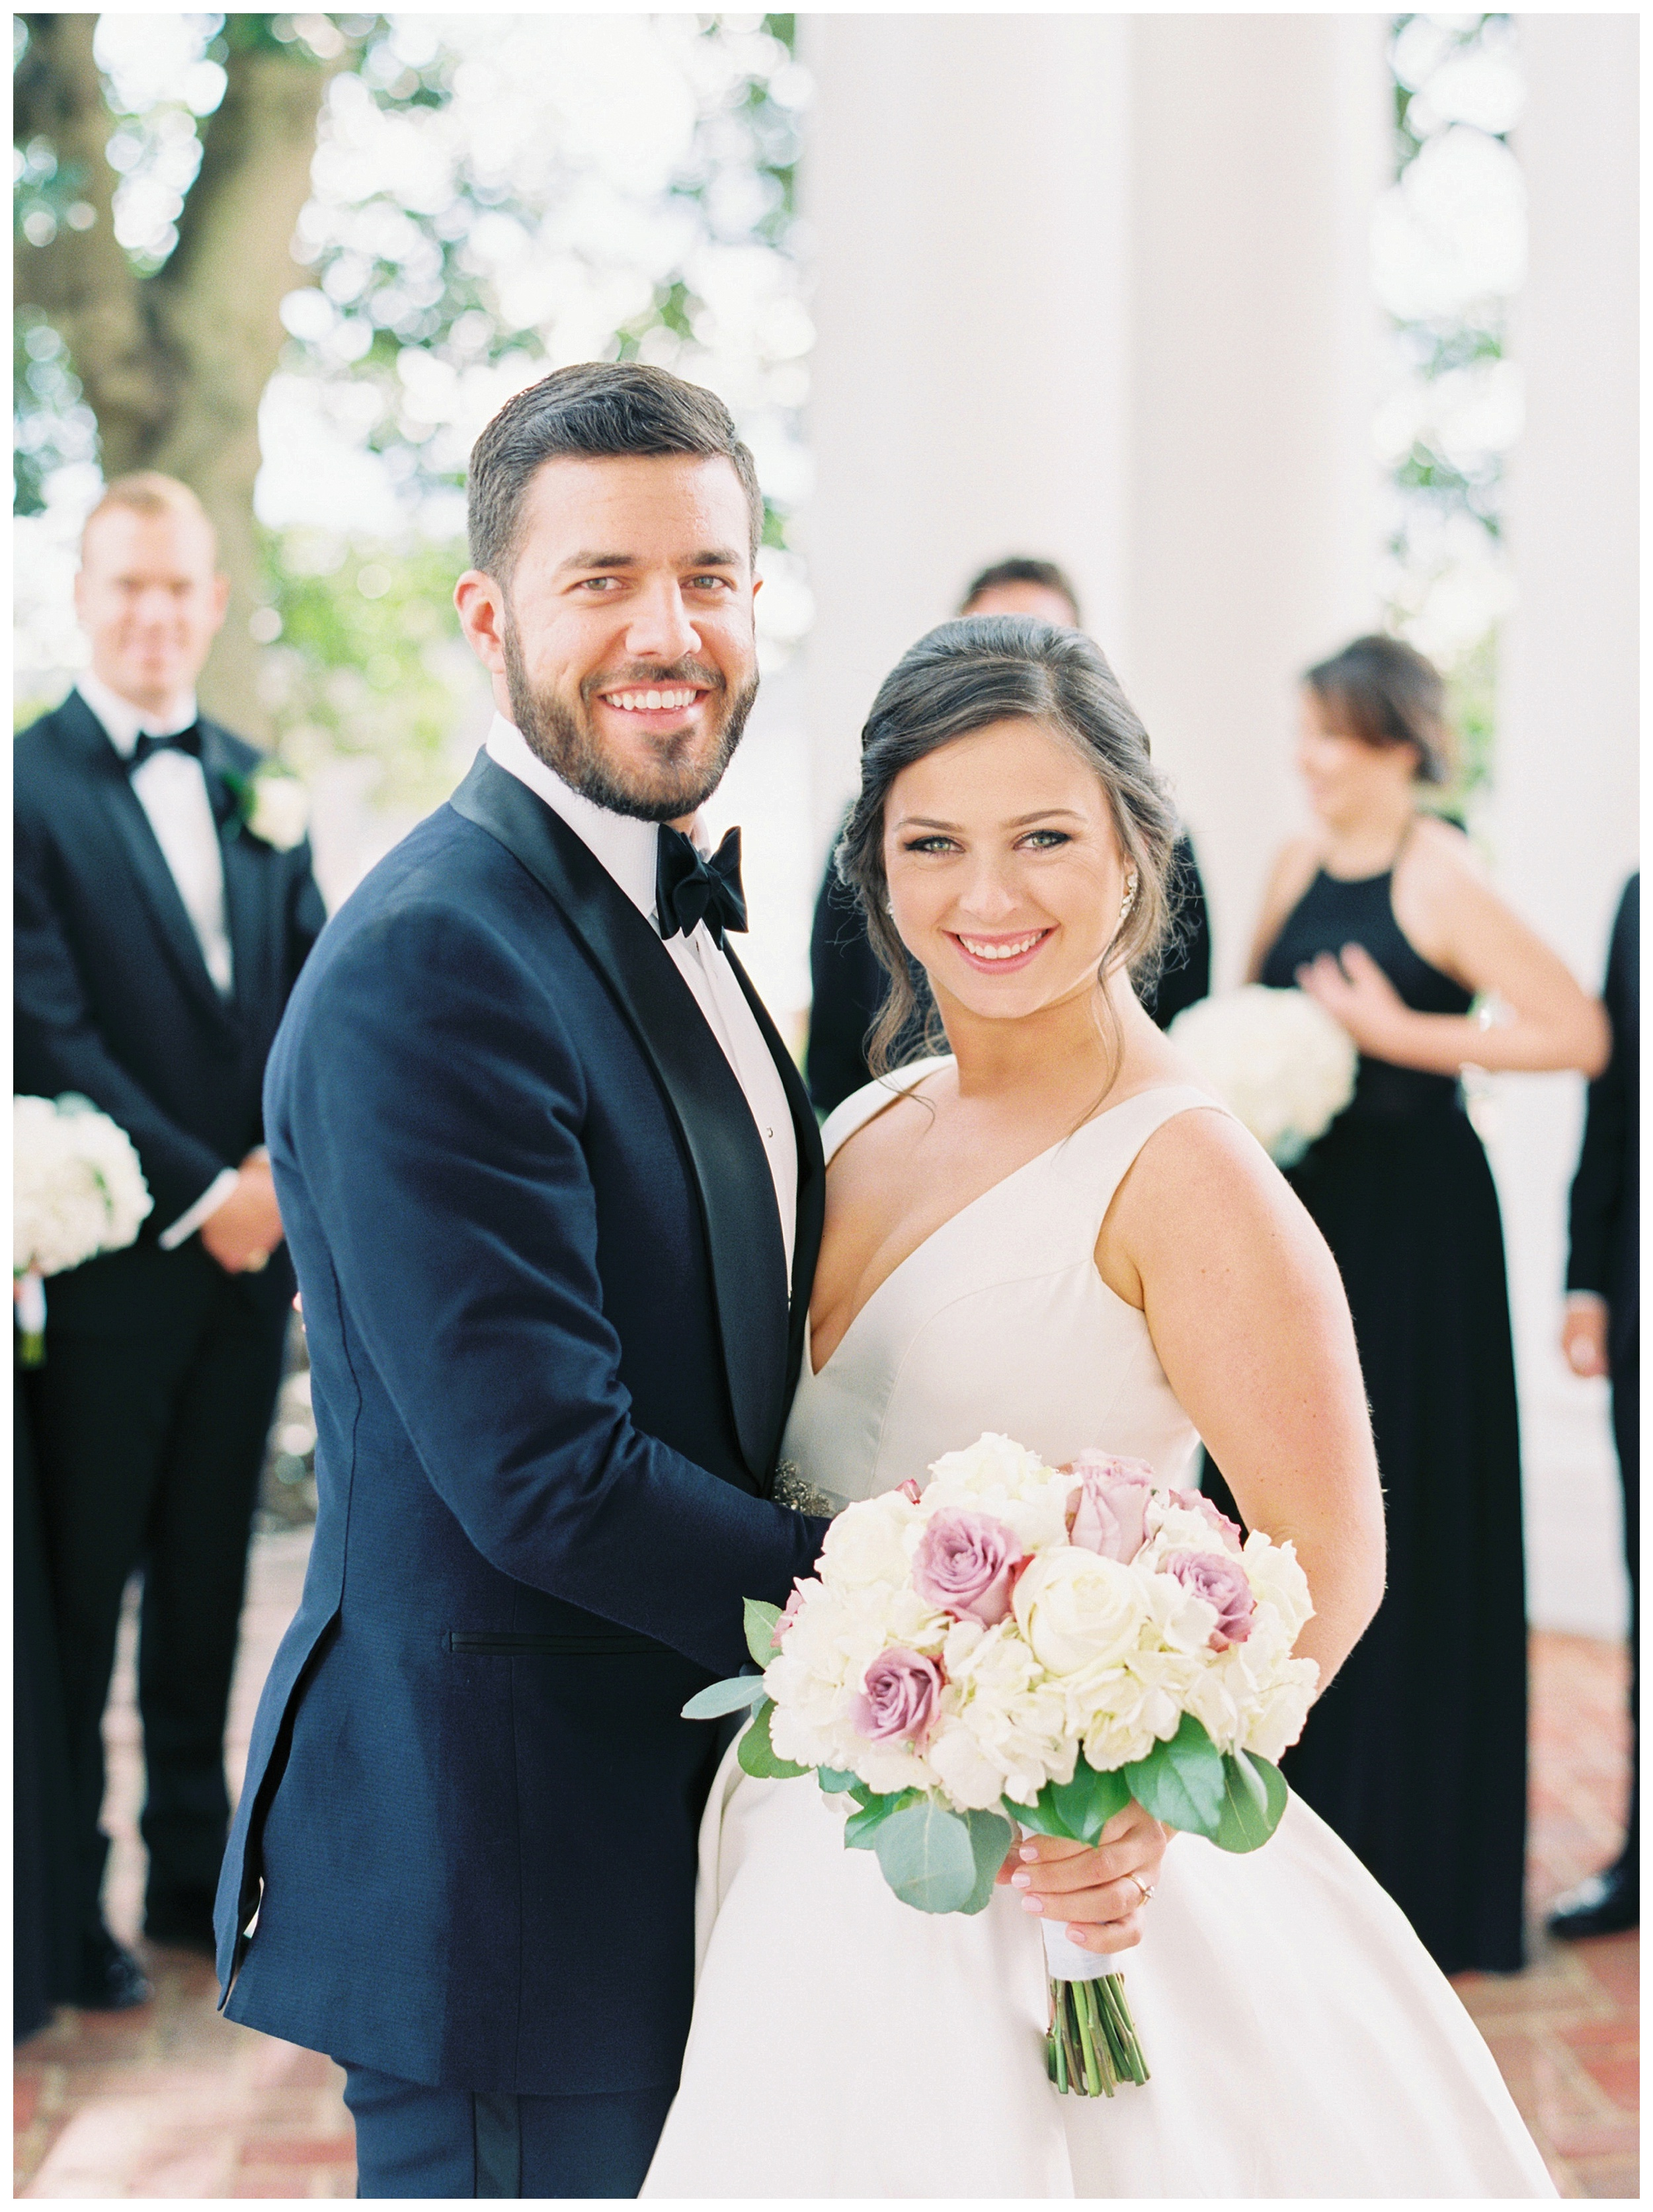 Country Club of Virginia Wedding | Richmond Wedding Photographer_0079.jpg